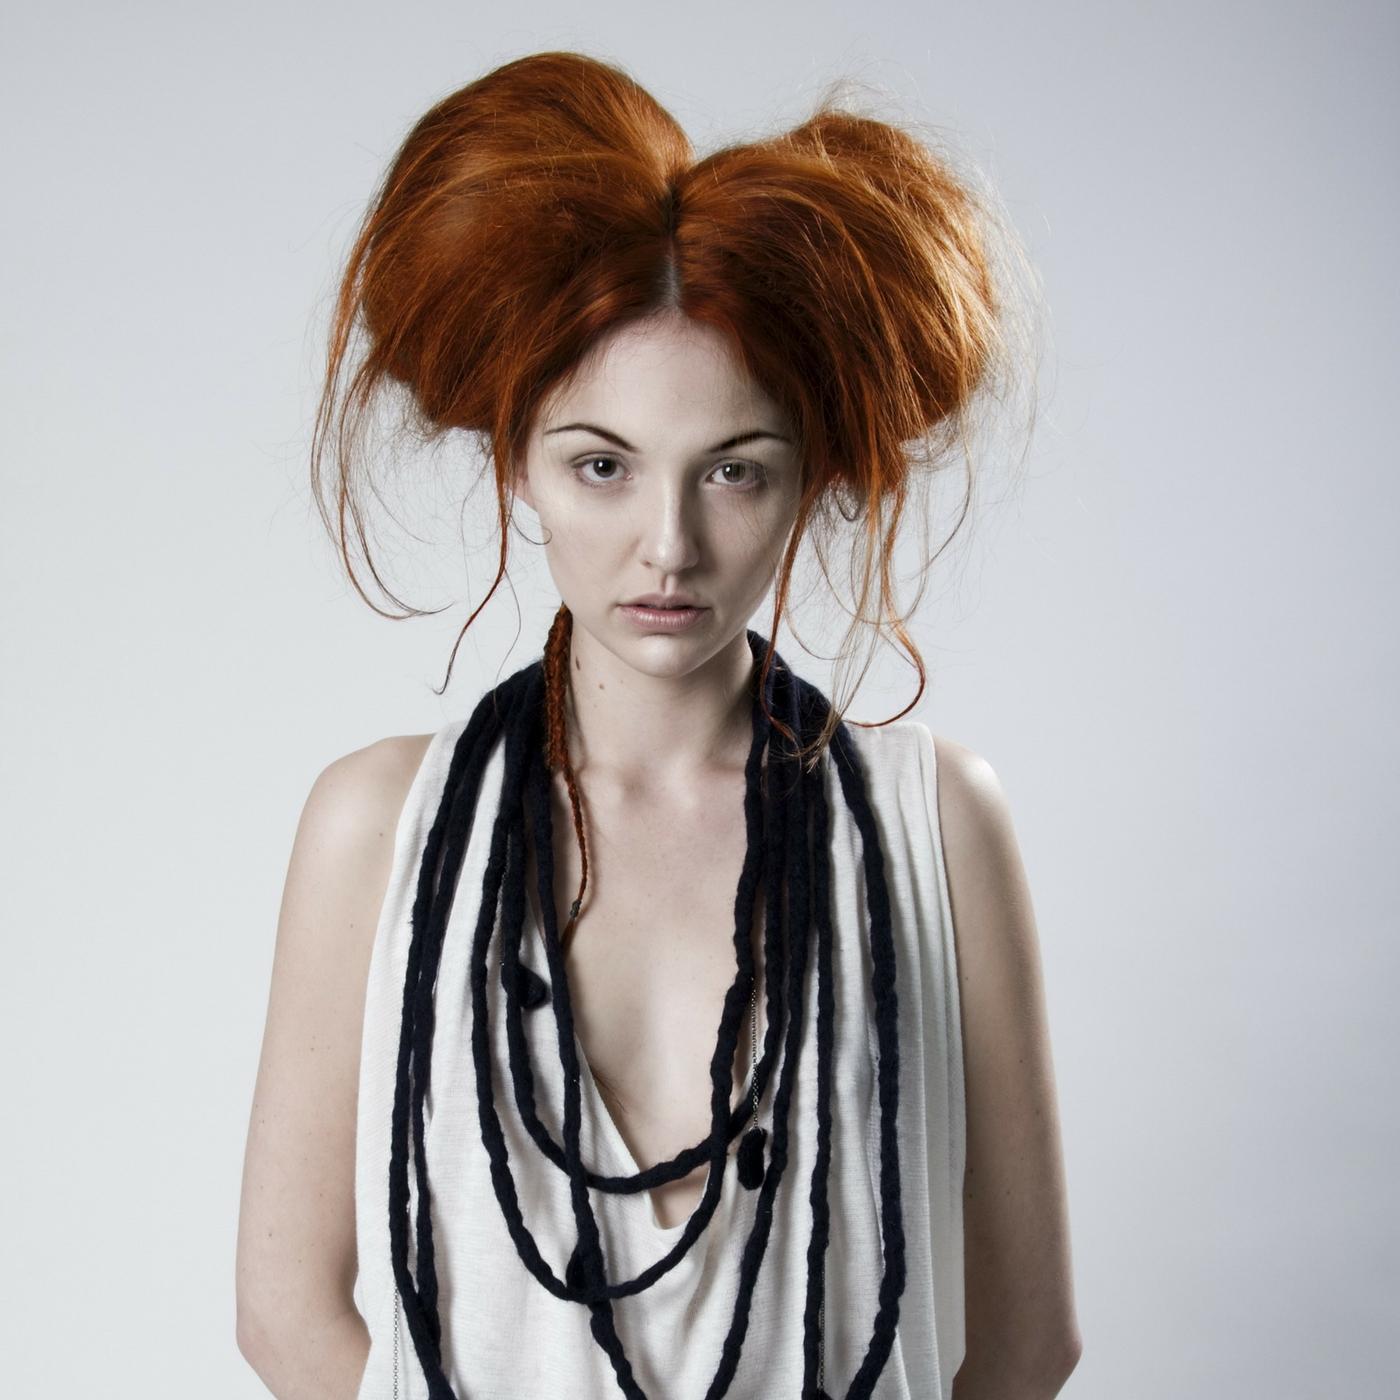 photoshoot makeup and hair.jpg